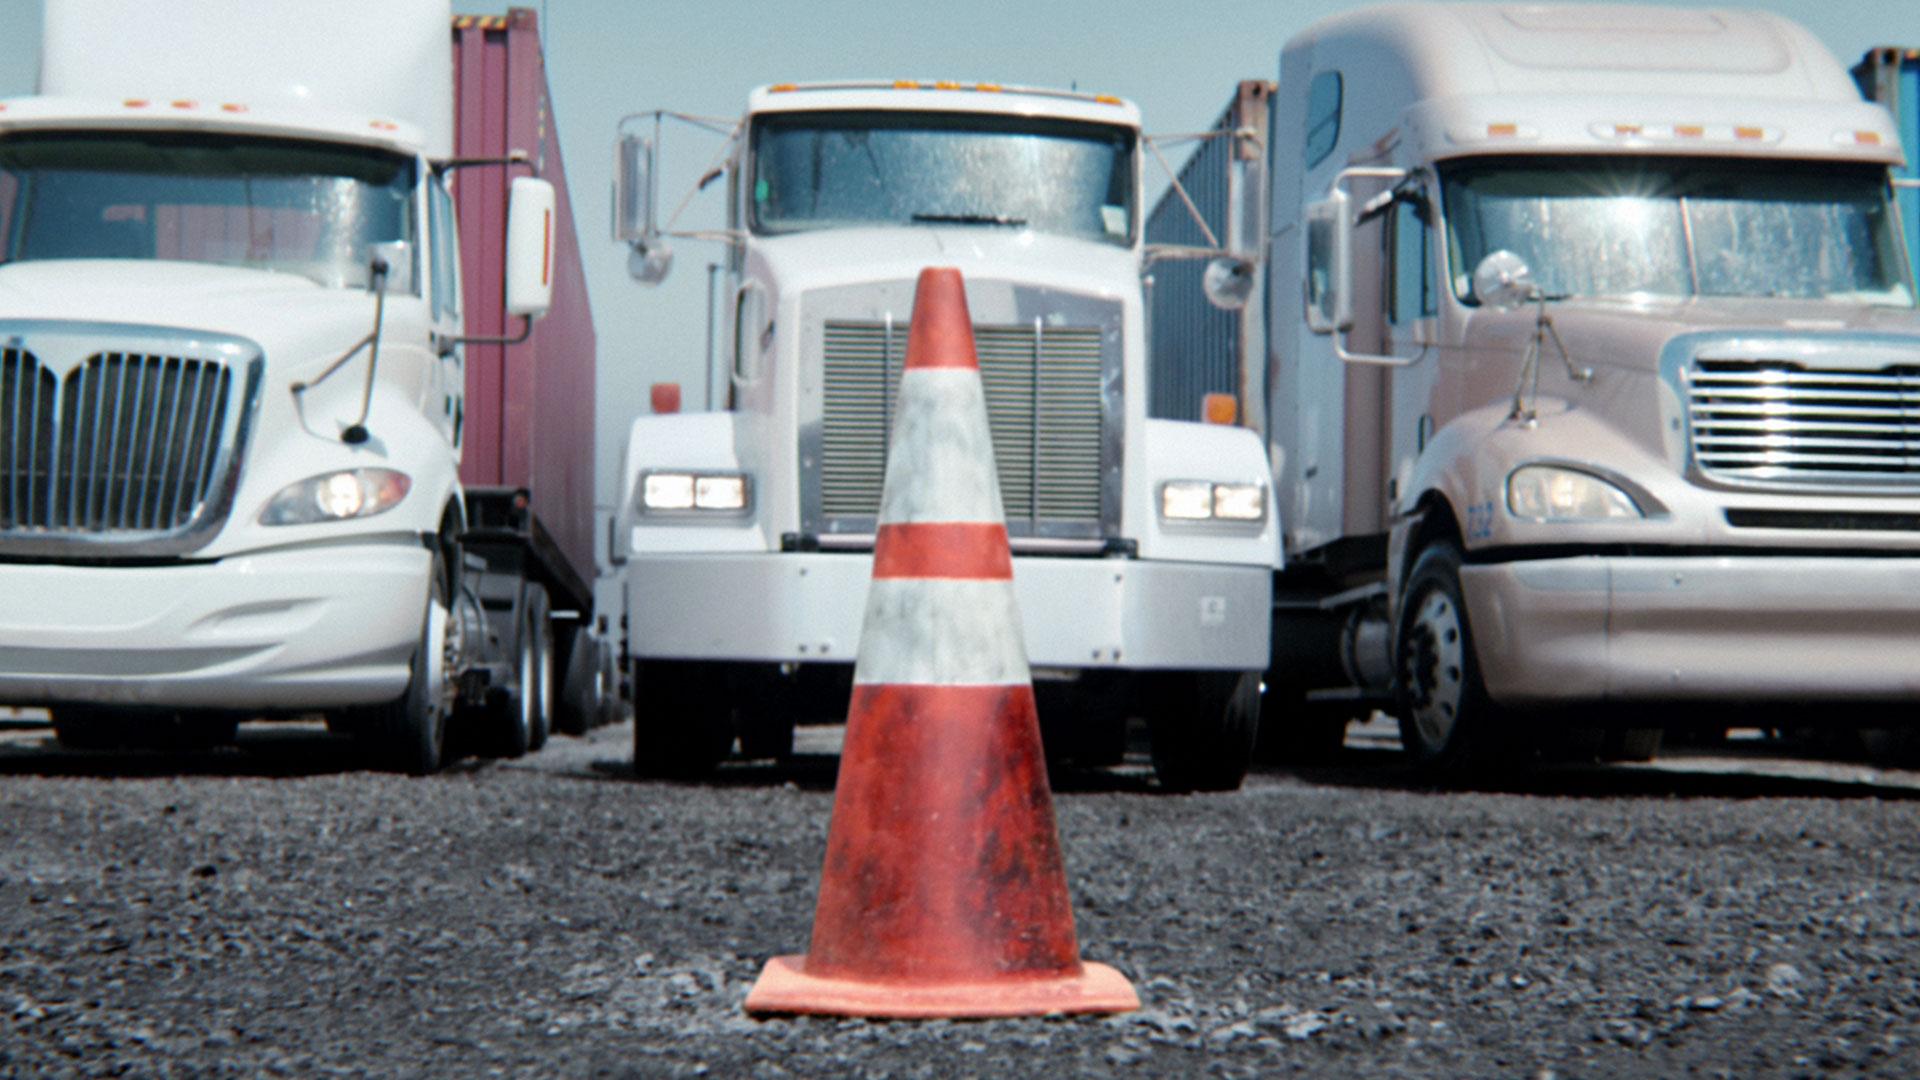 outdoor truck land vehicle vehicle ground wheel transport auto part concrete mixer trailer